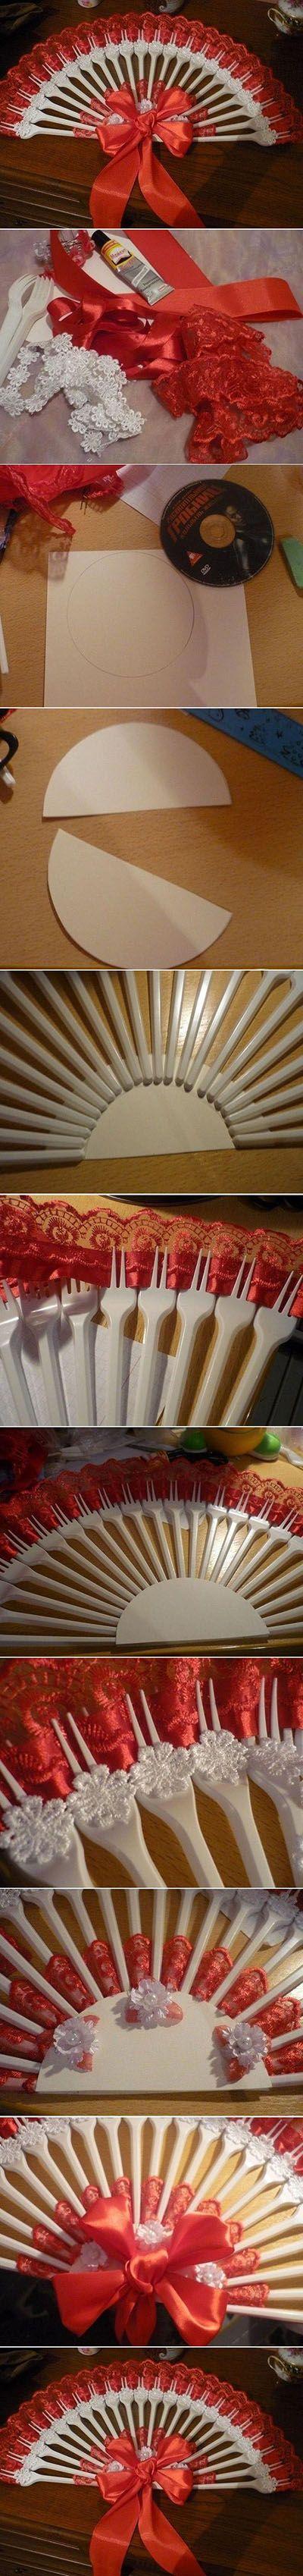 Beautiful Fan Craft | DIY & Crafts Tutorials